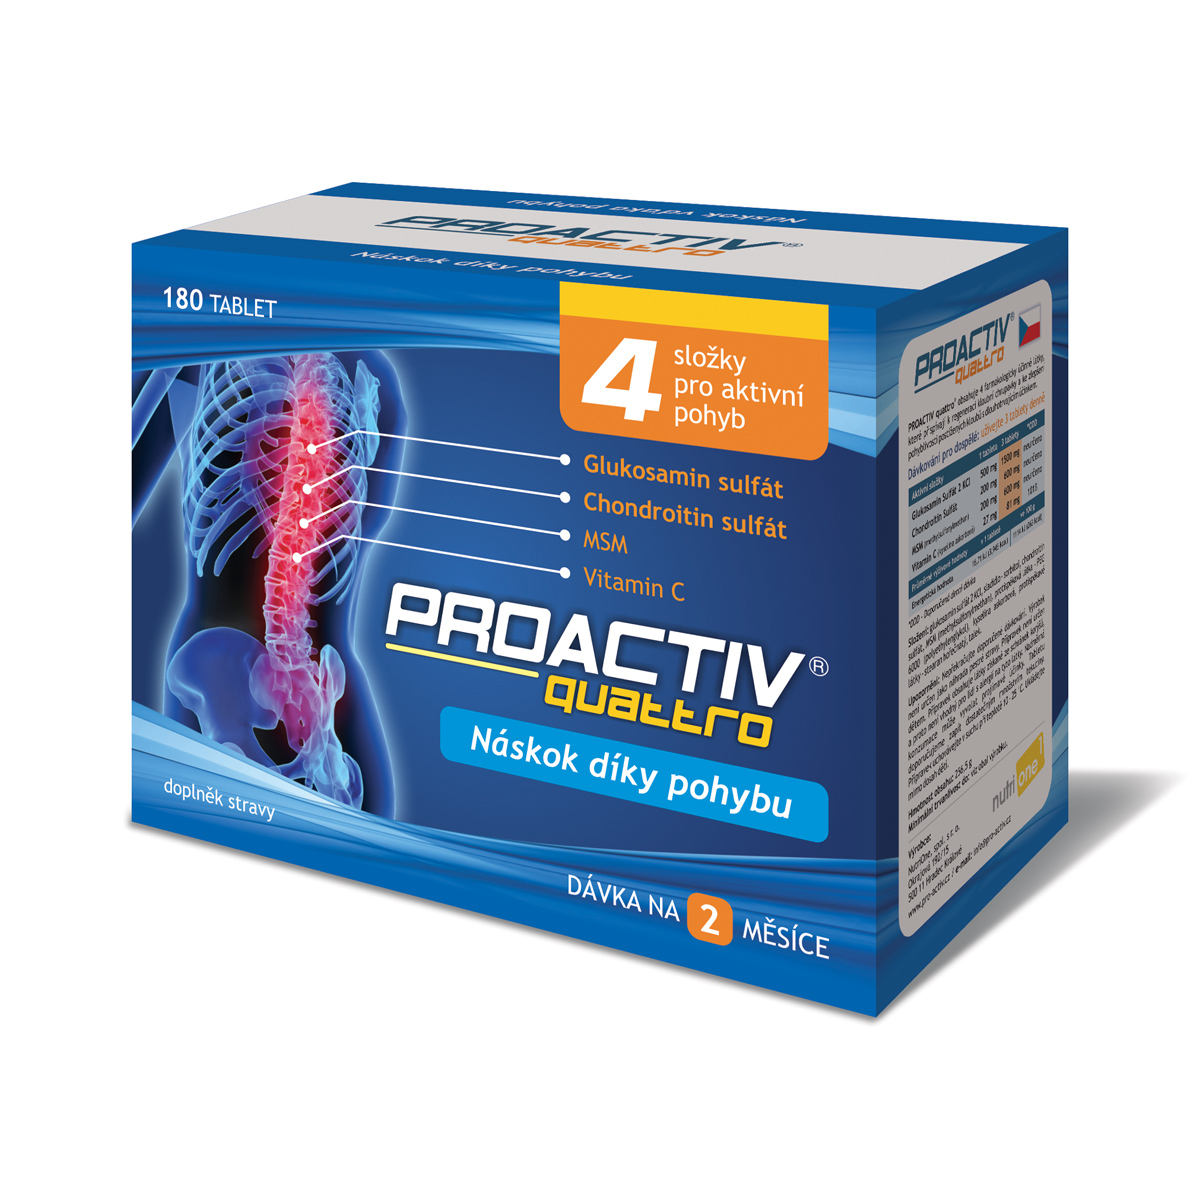 G-Marck ProActiv quattro 180 cps